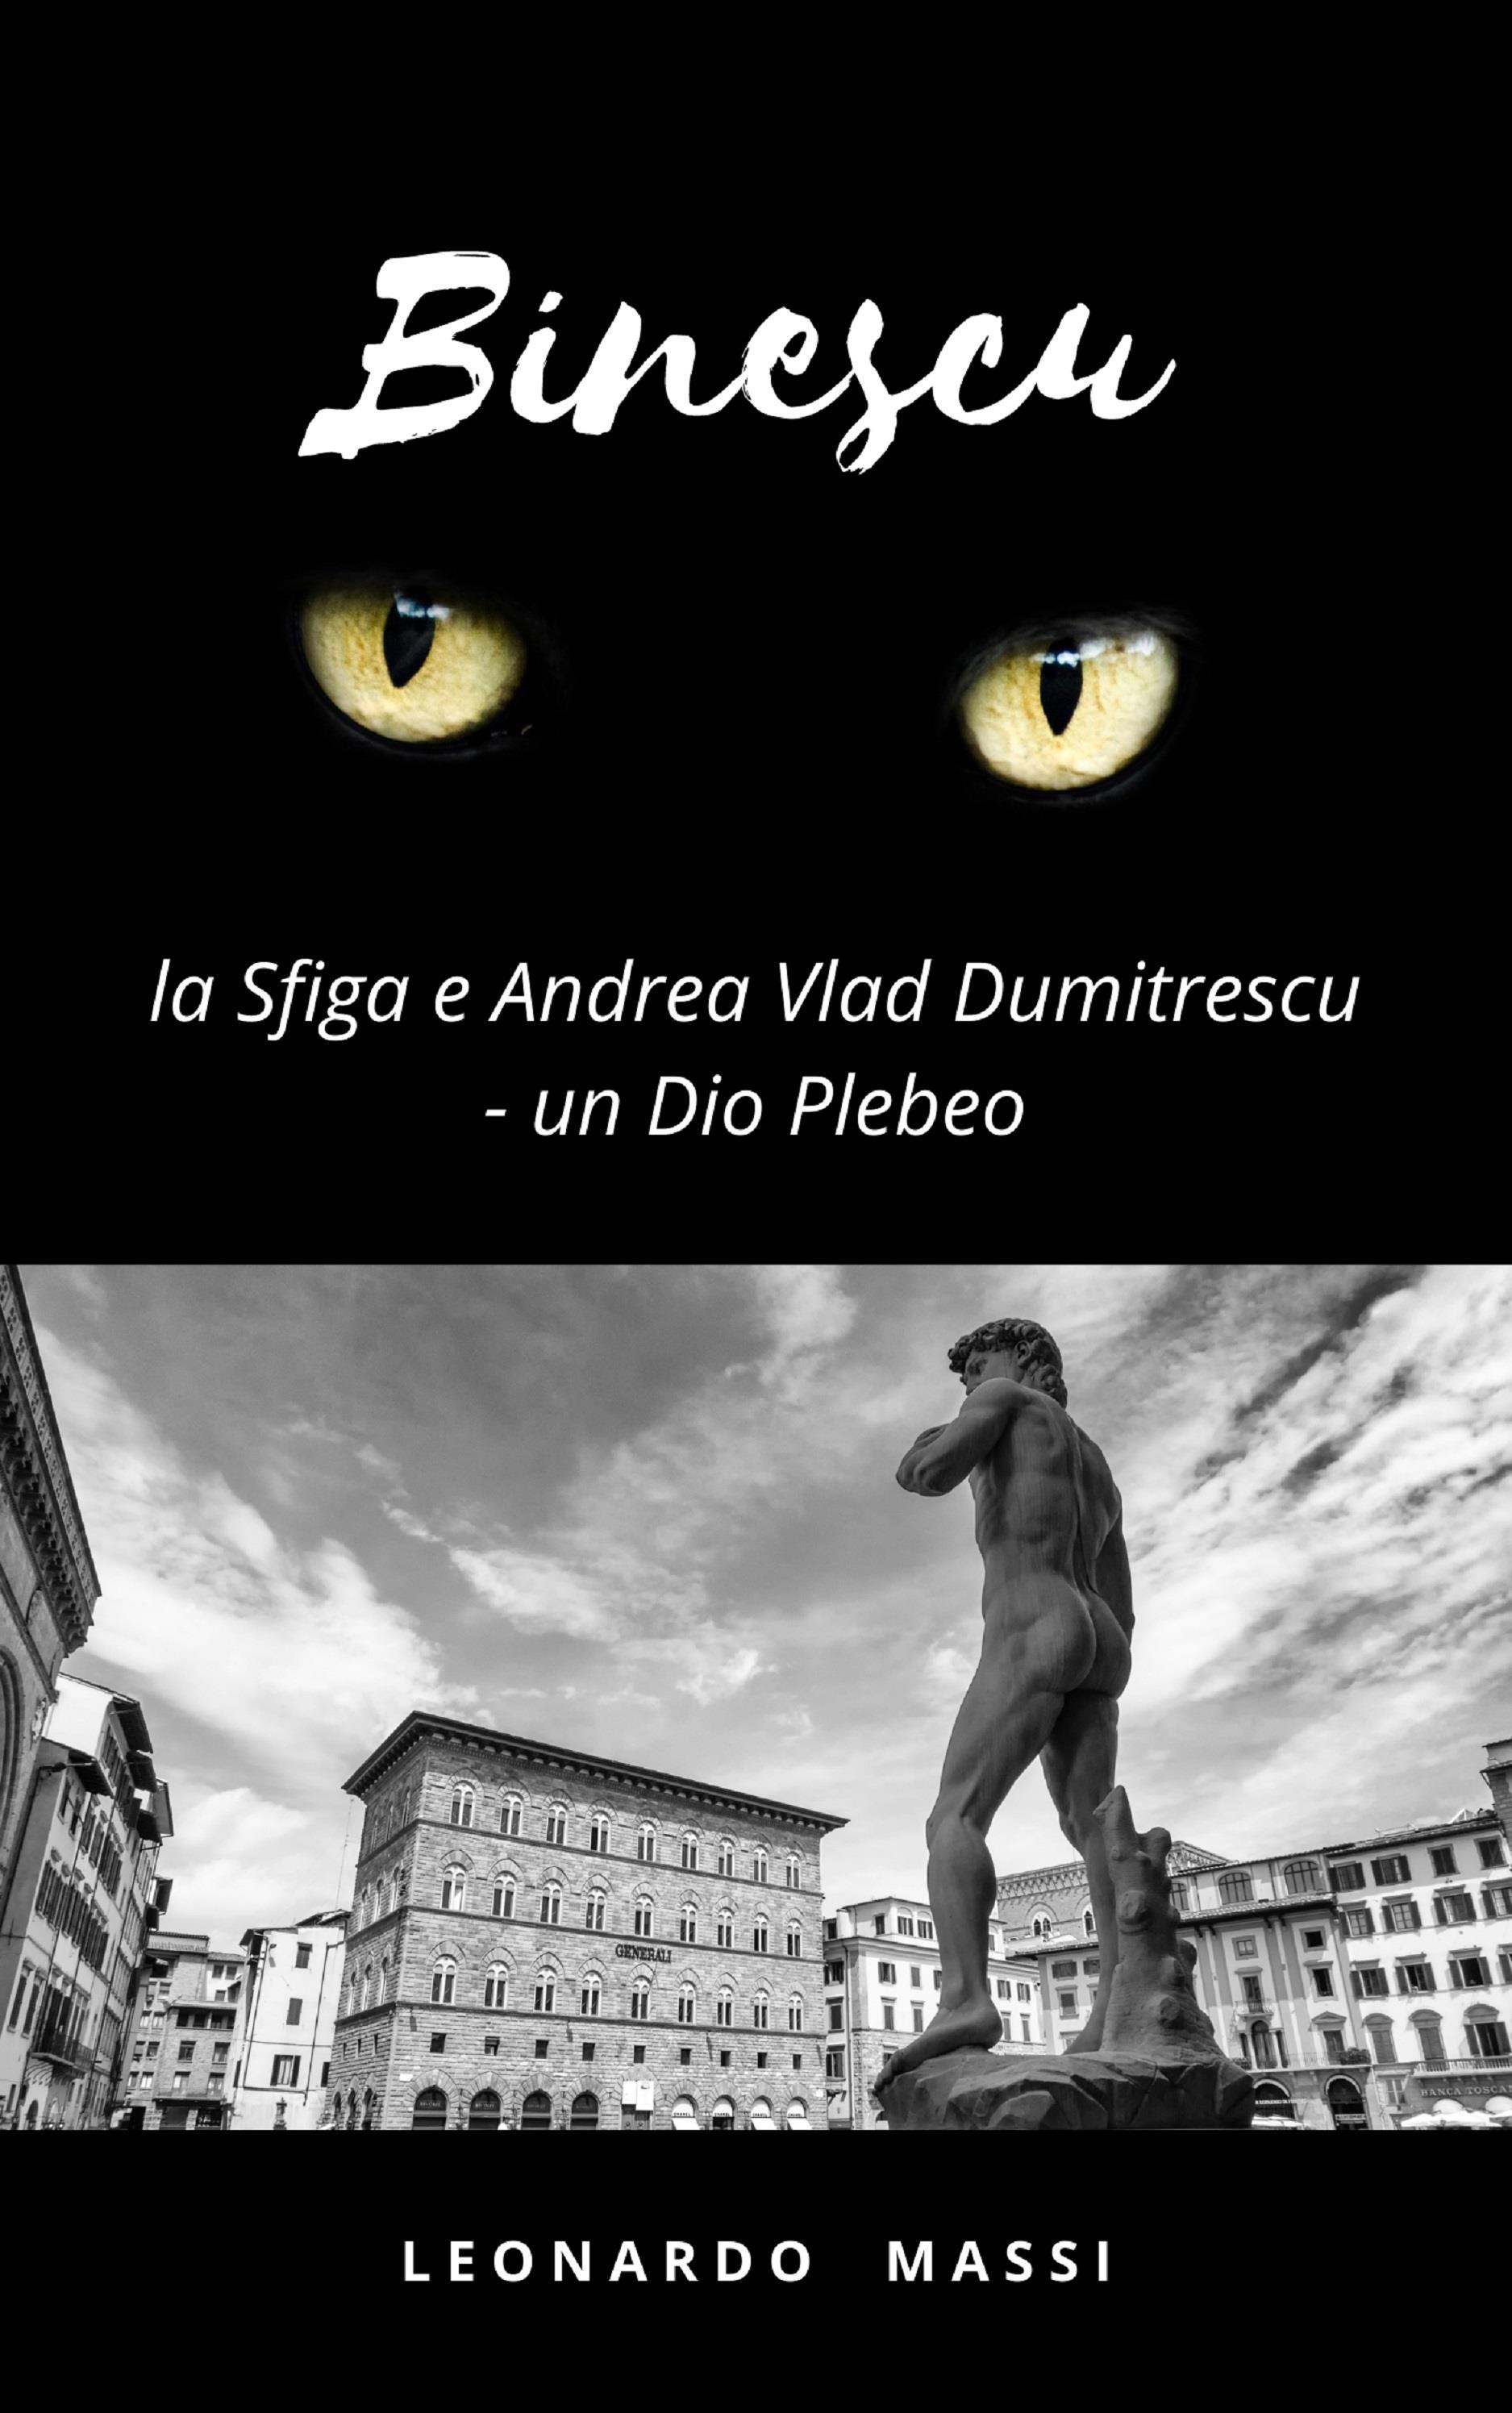 Binescu, la Sfiga e Andrea Vlad Dumitrescu